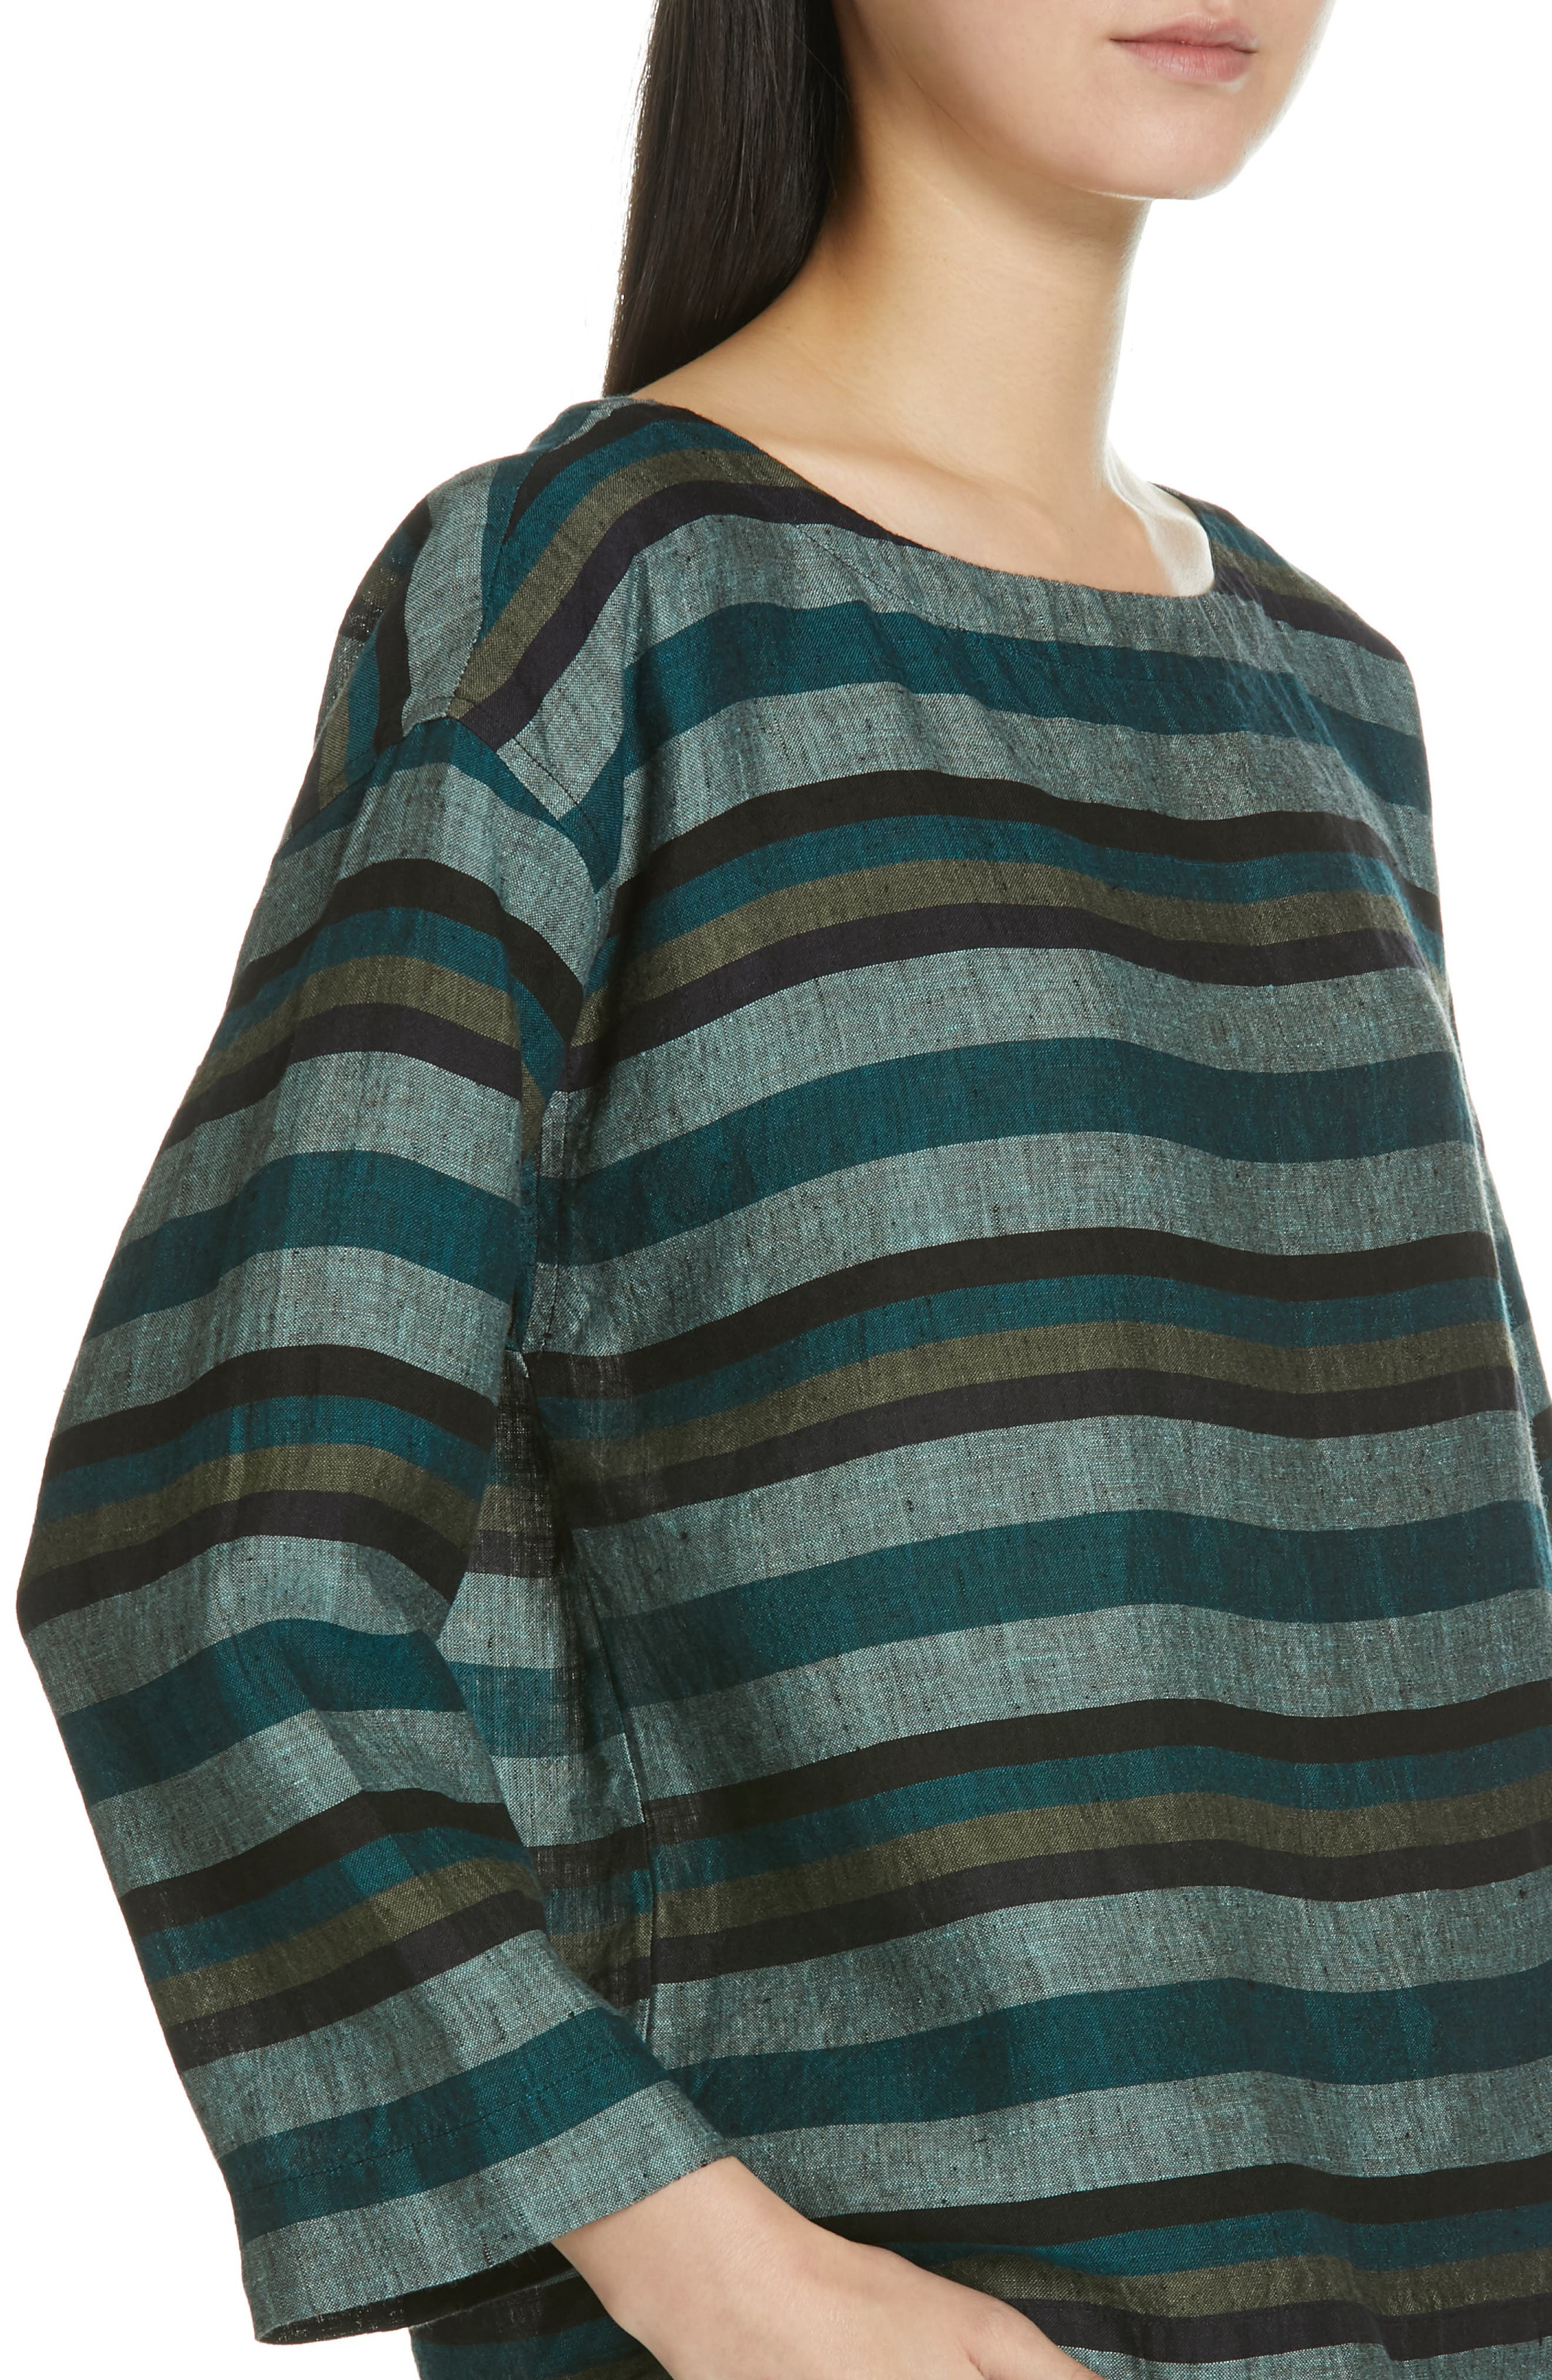 Stripe Organic Linen Top,                             Alternate thumbnail 4, color,                             TEAL